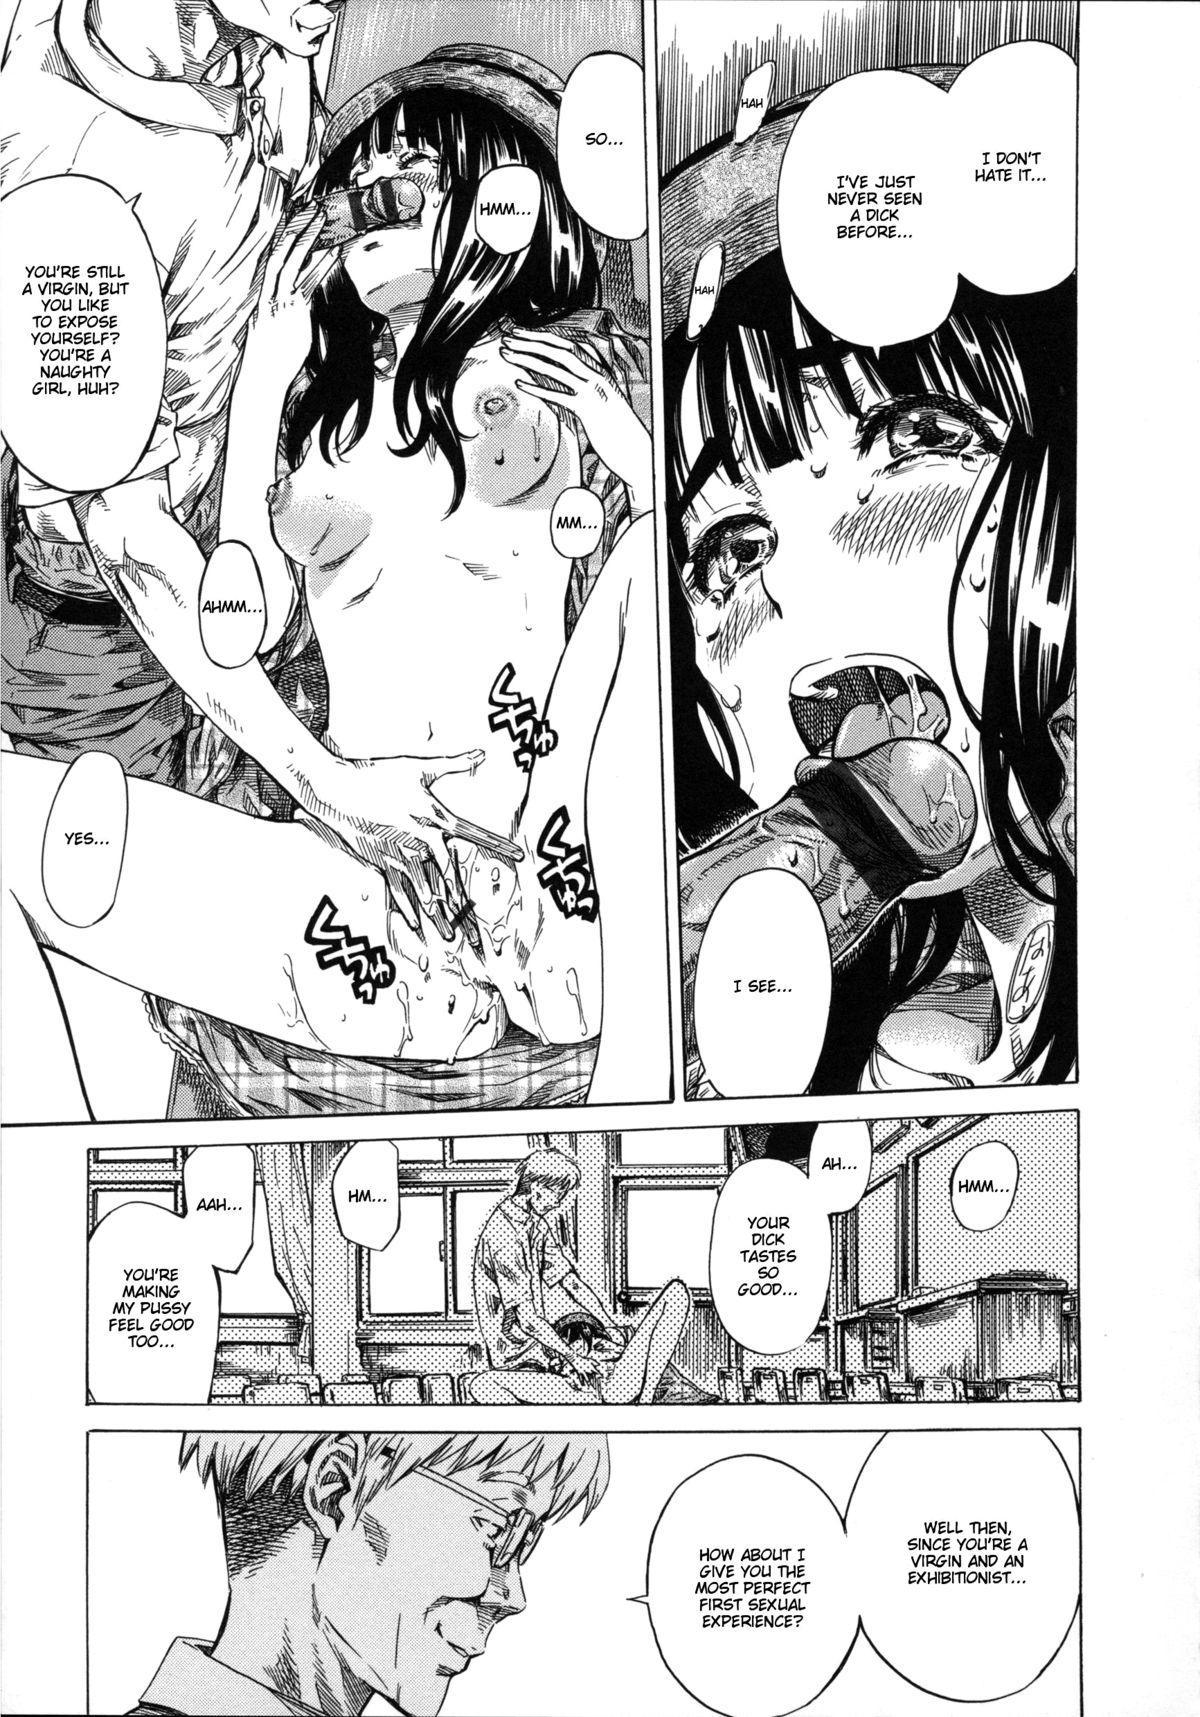 Kashiwazaki Miki wa Ironna Basho de Zenra Sanpo Shitemita   Miki Kashiwazaki Goes Naked in All Sorts of Places Ch. 1-4 18